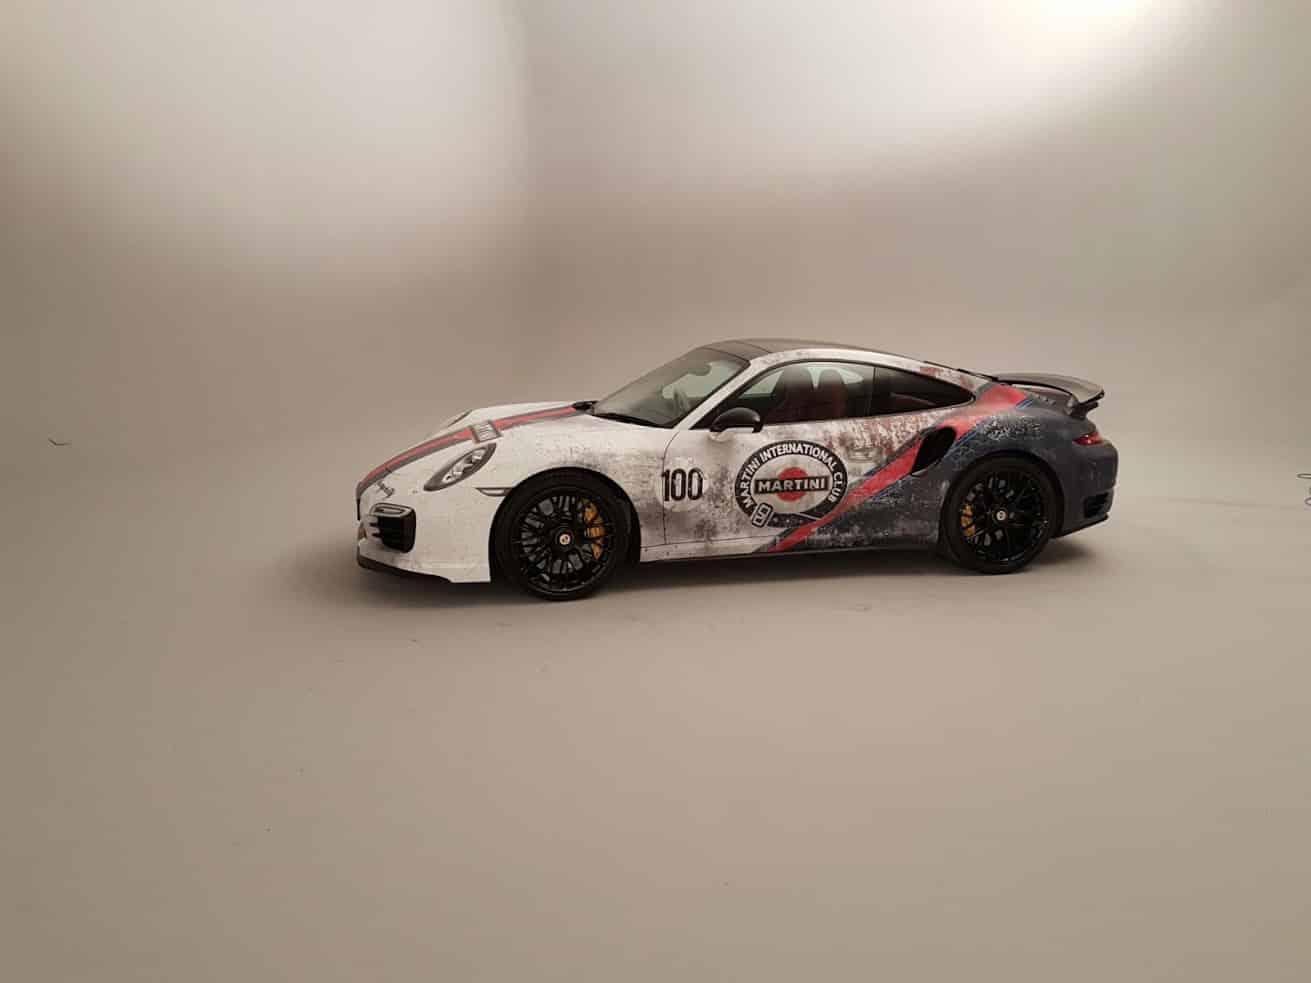 Retro Martini Weathered Livery Porsche Turbo S Skepple Inc